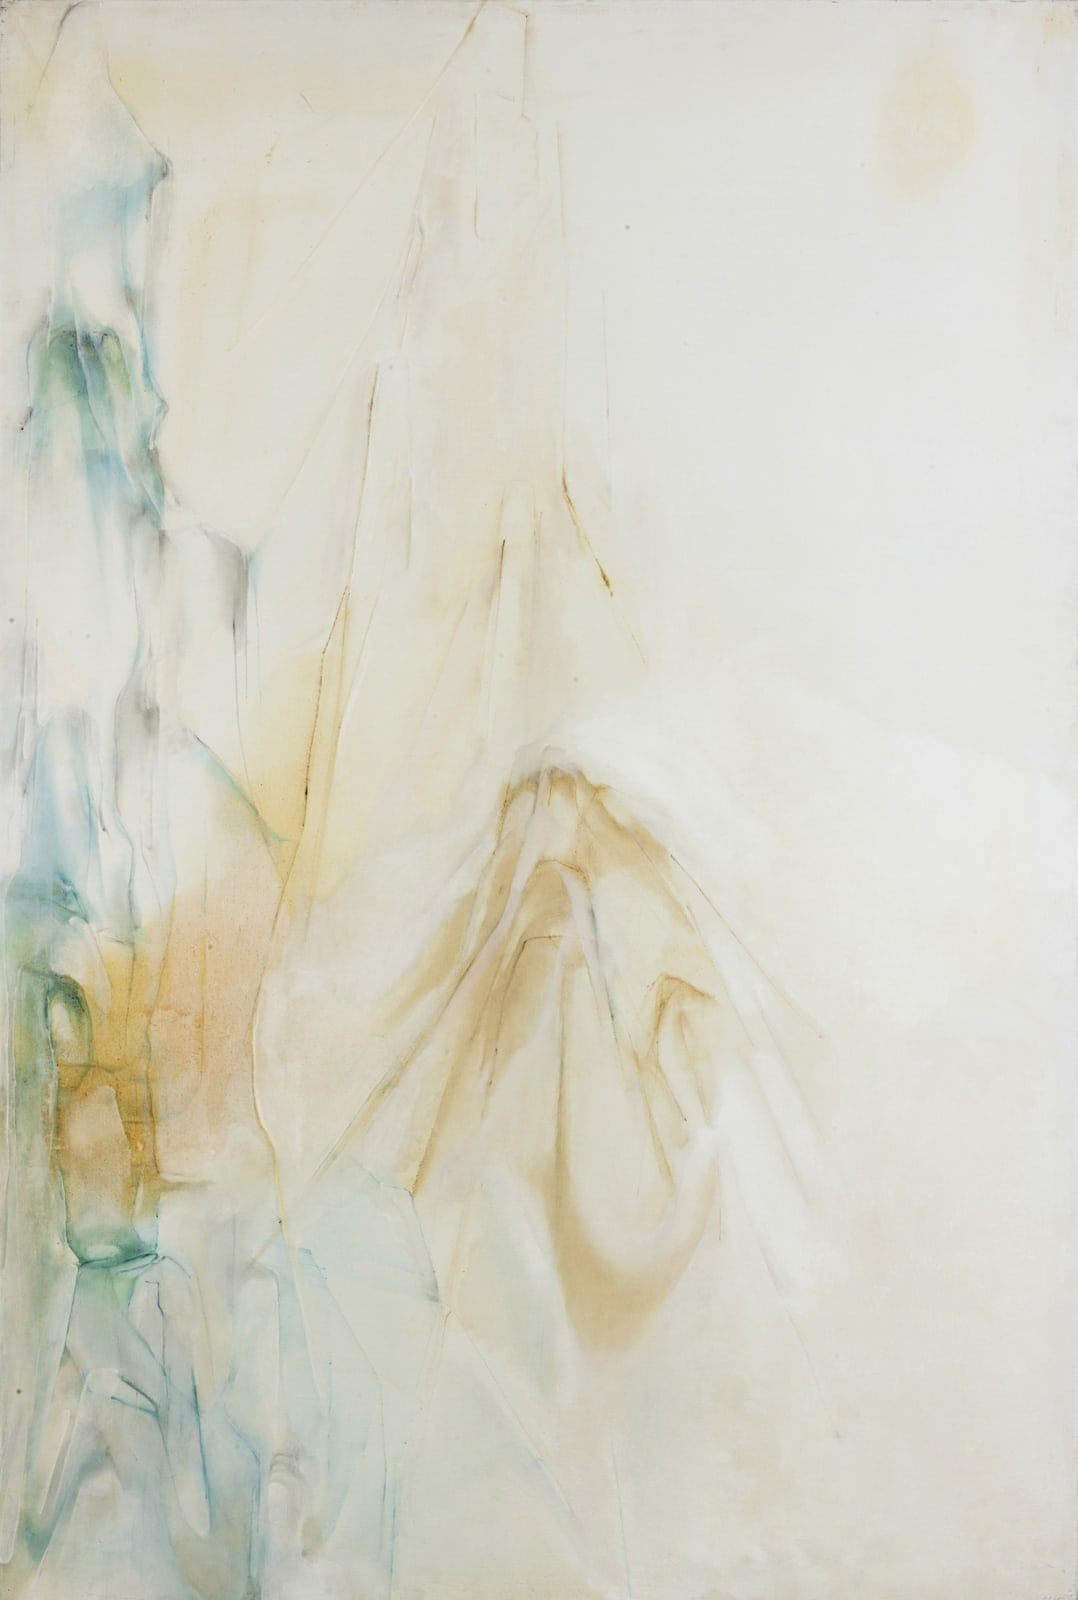 Lalan 謝景蘭, Les Rocs Verts | Green Stone《綠石》, 1979